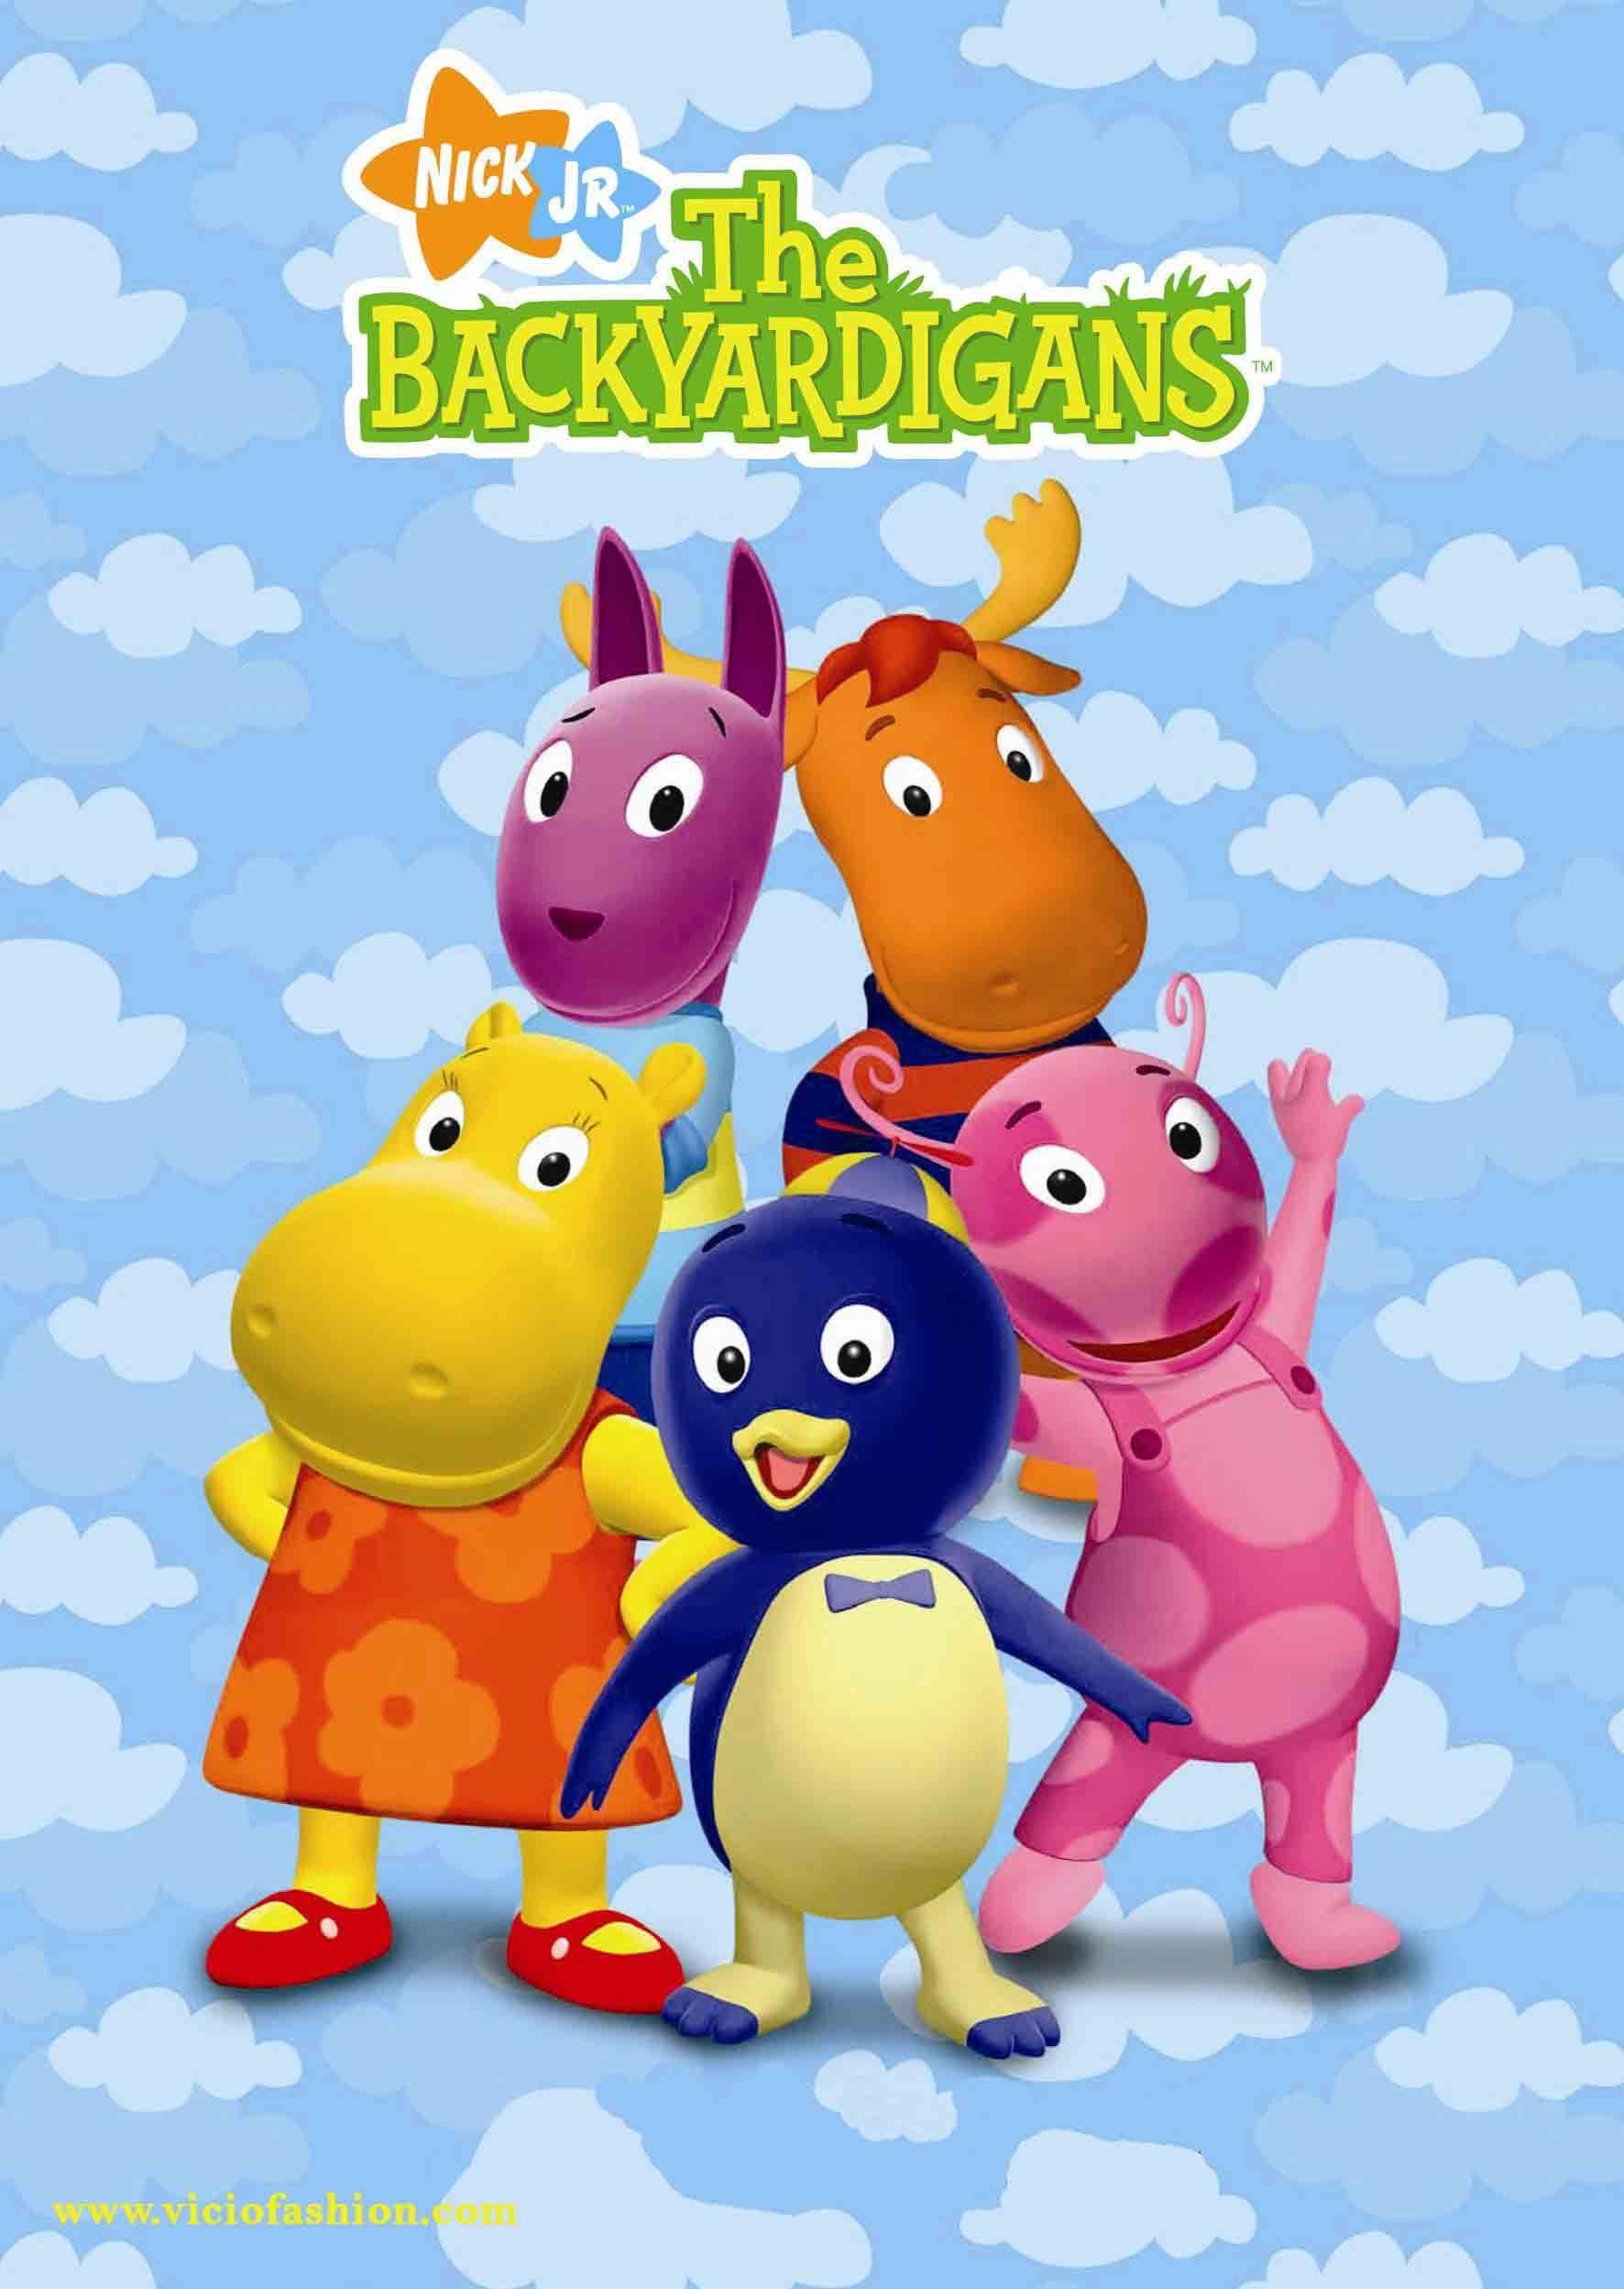 The Backyardigans 2004 2010 Childhood Tv Shows Childhood